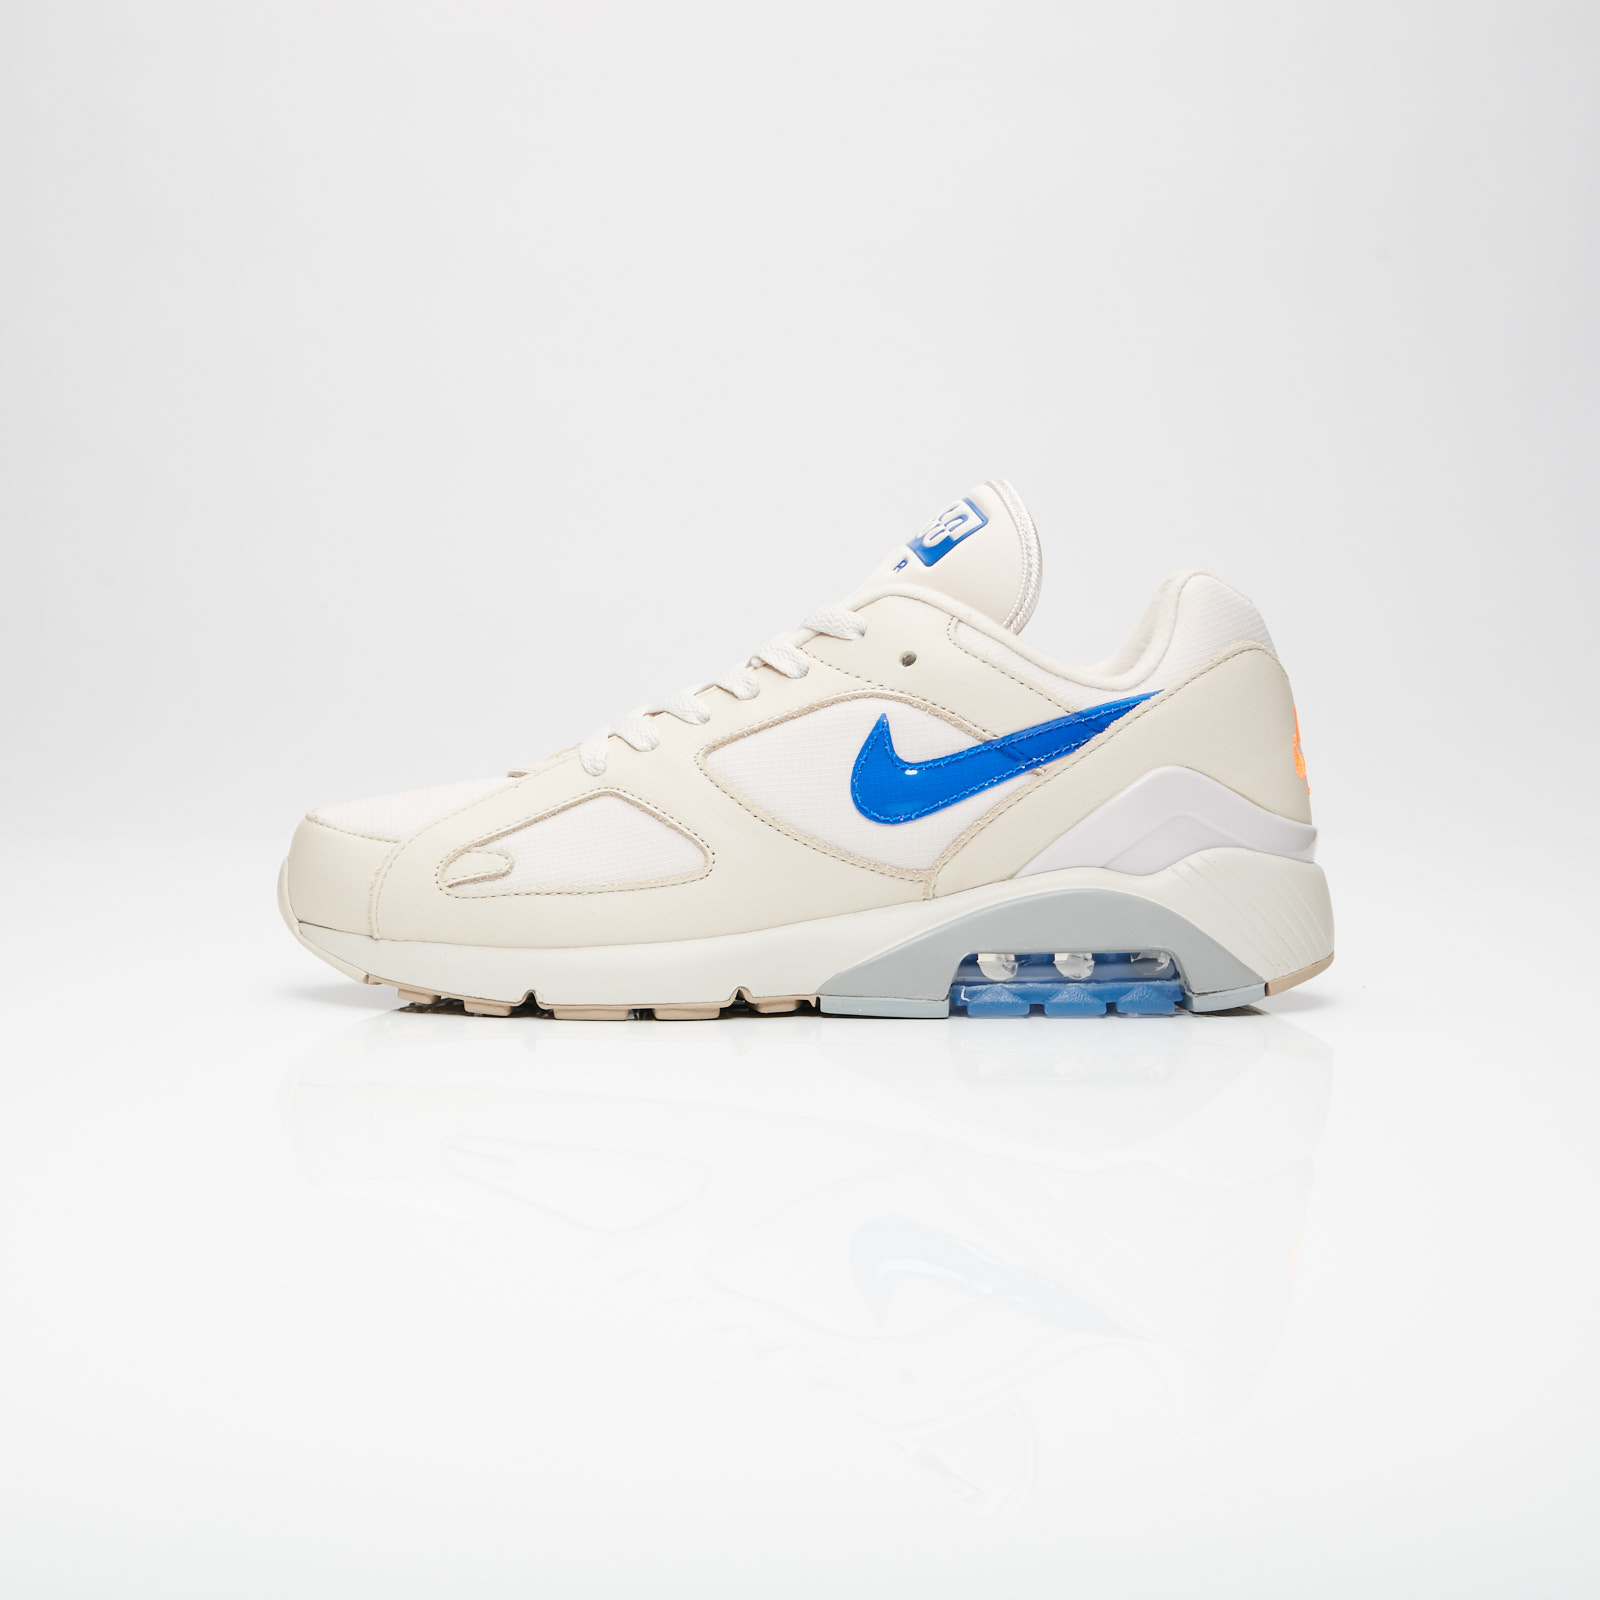 Nike Air Max 180 - Aq9974-002 - SNS   sneakers & streetwear online ...